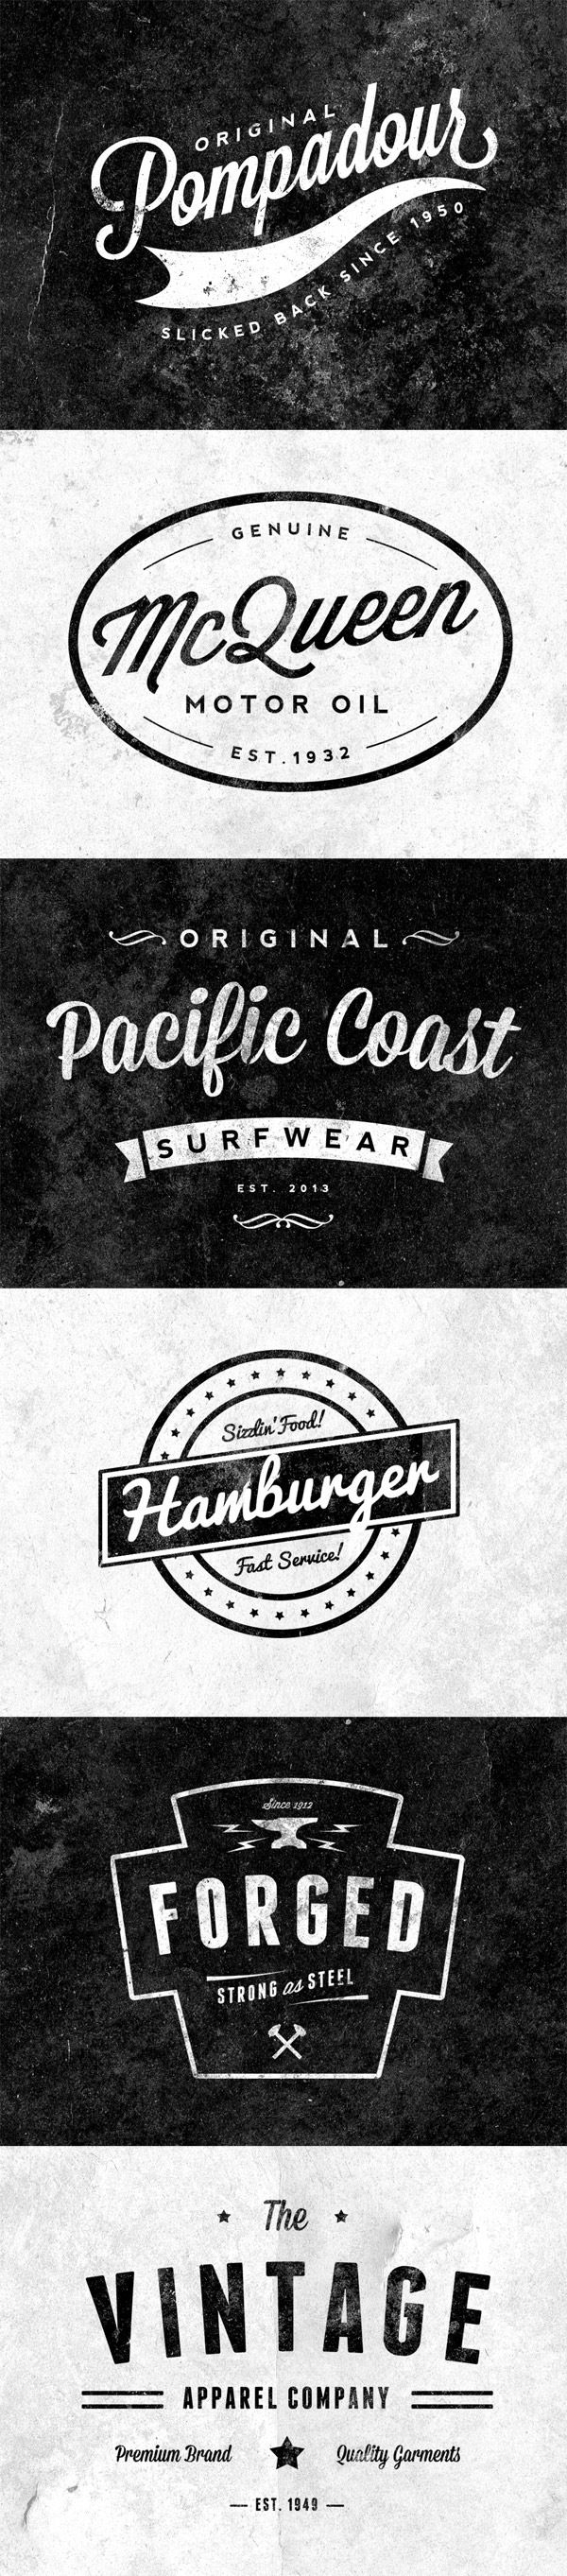 http://blog.spoongraphics.co.uk/freebies/6-free-customizable-retrovintage-logos-emblems